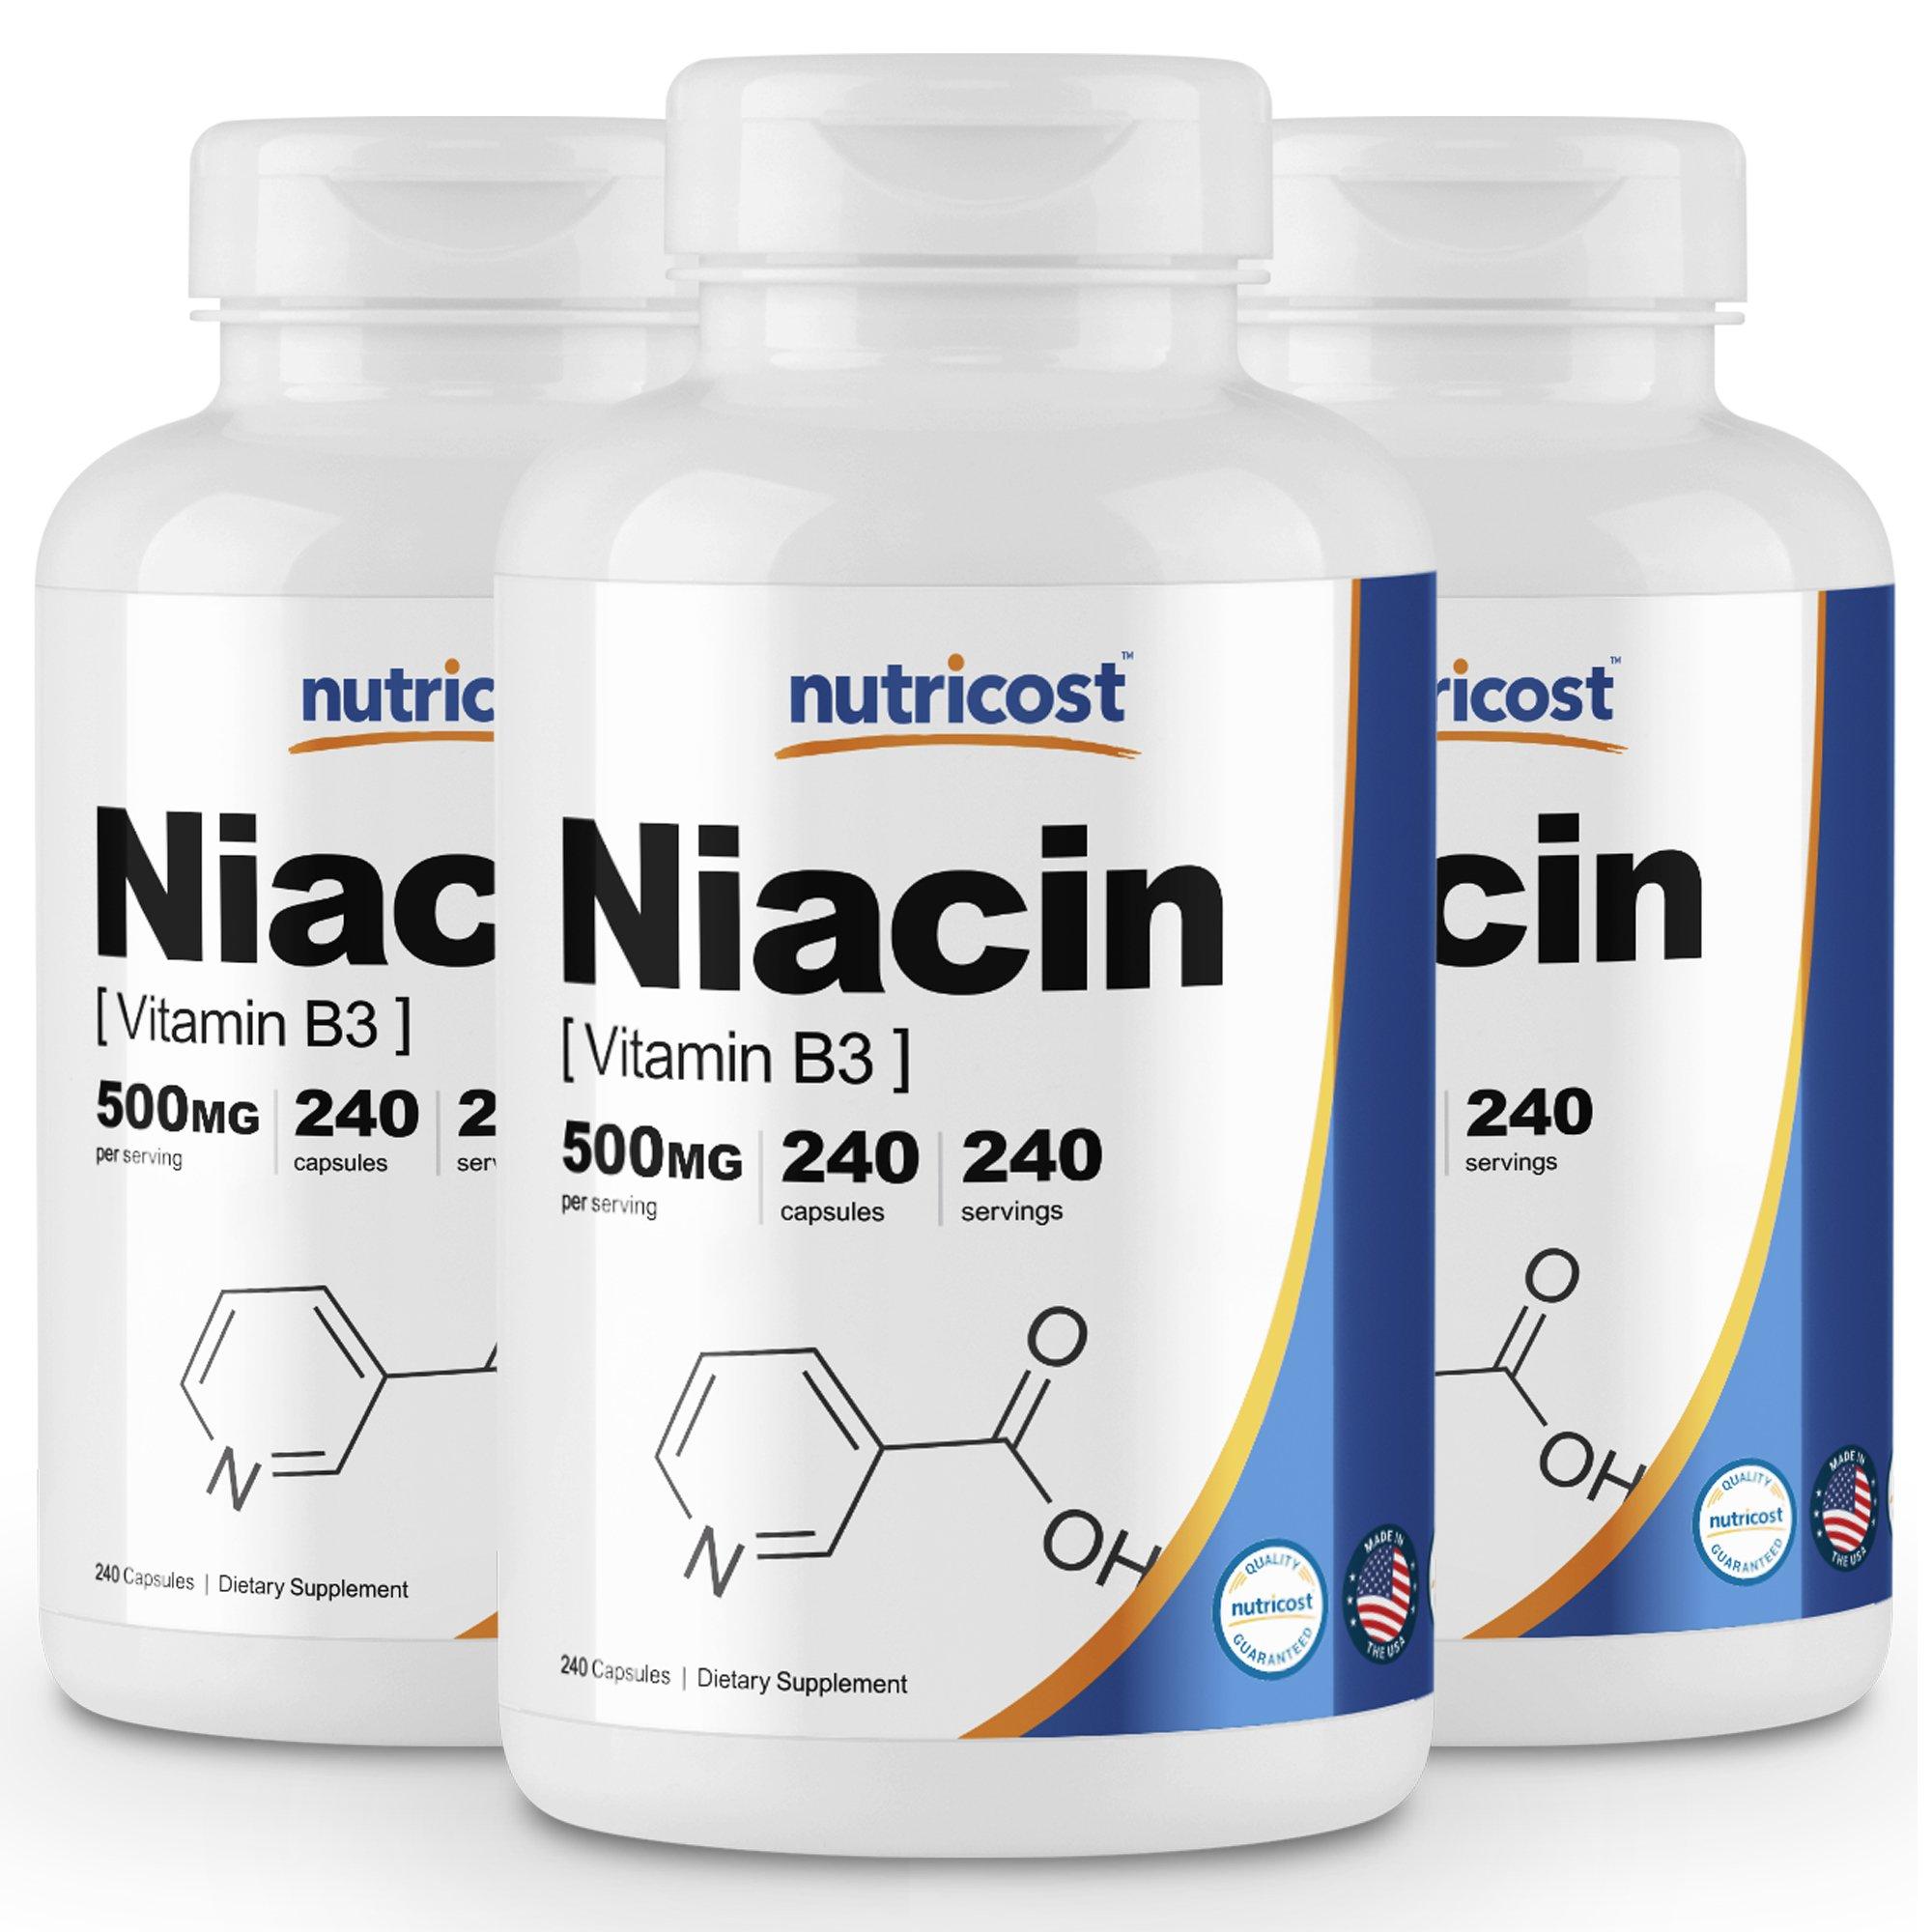 Nutricost Niacin (Vitamin B3) 500mg, 240 Capsules (3 Bottles)